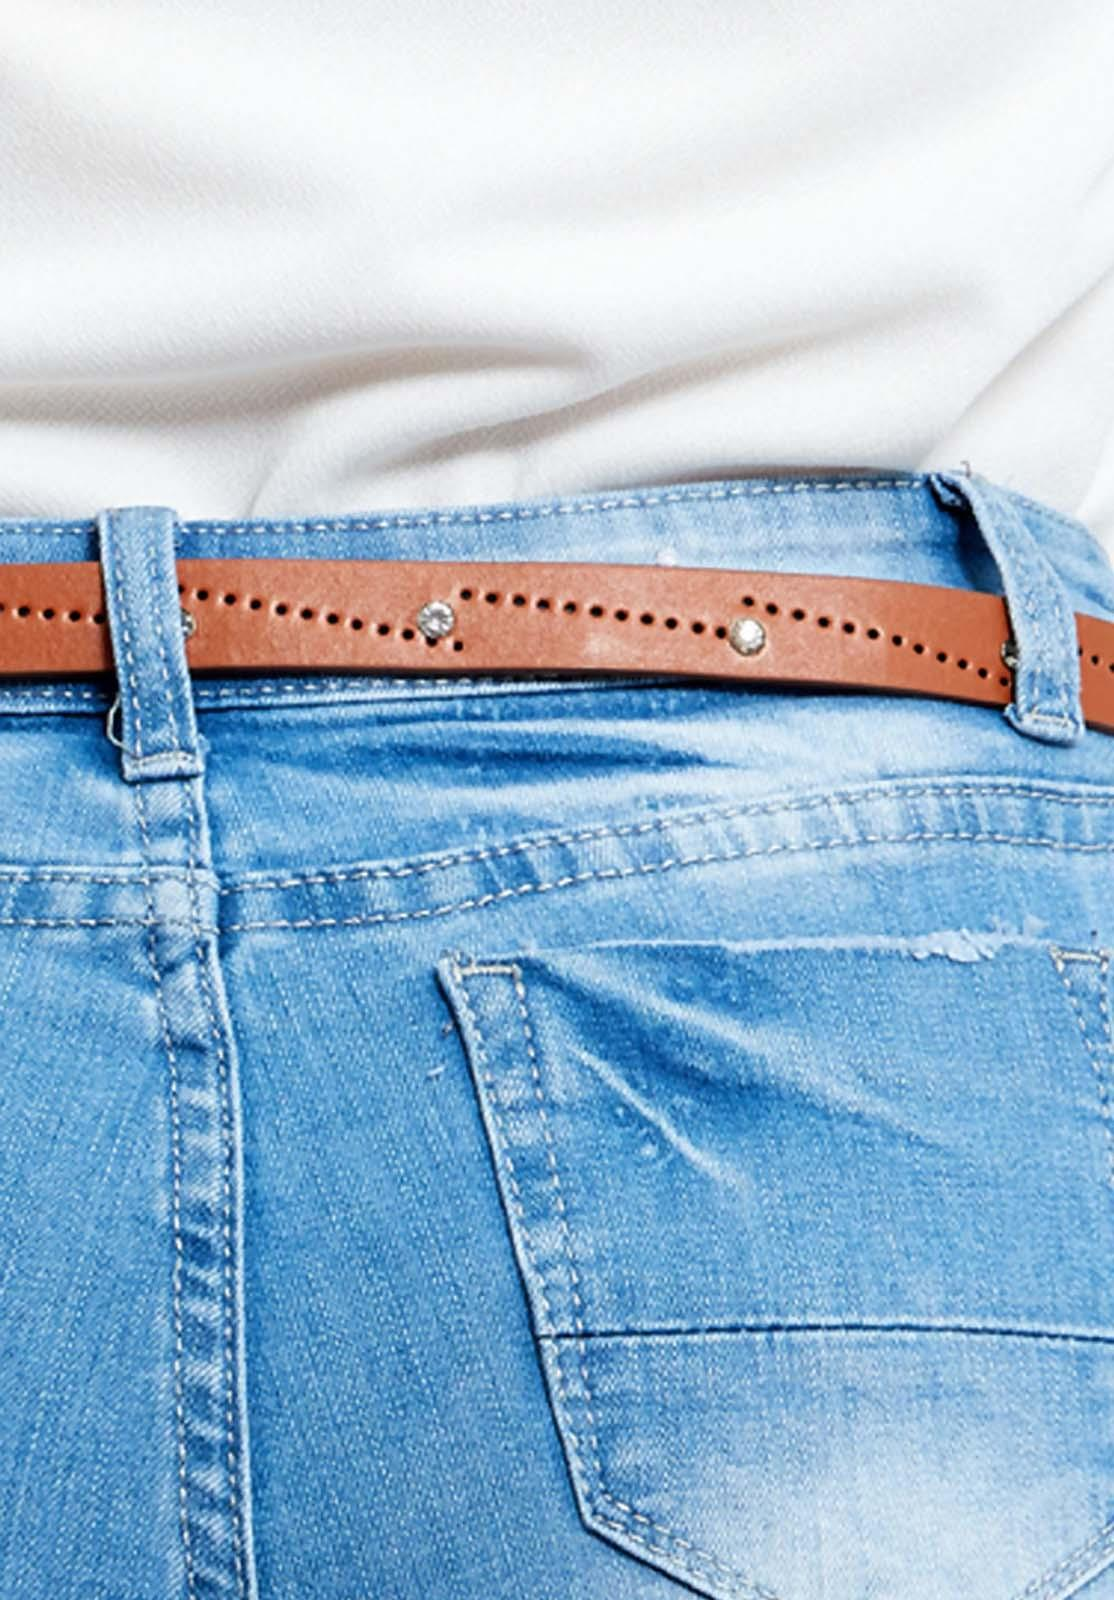 Ladies Brown Diamante Jeans Narrow Buckle Belt Womens Leather Thin Waist Strap